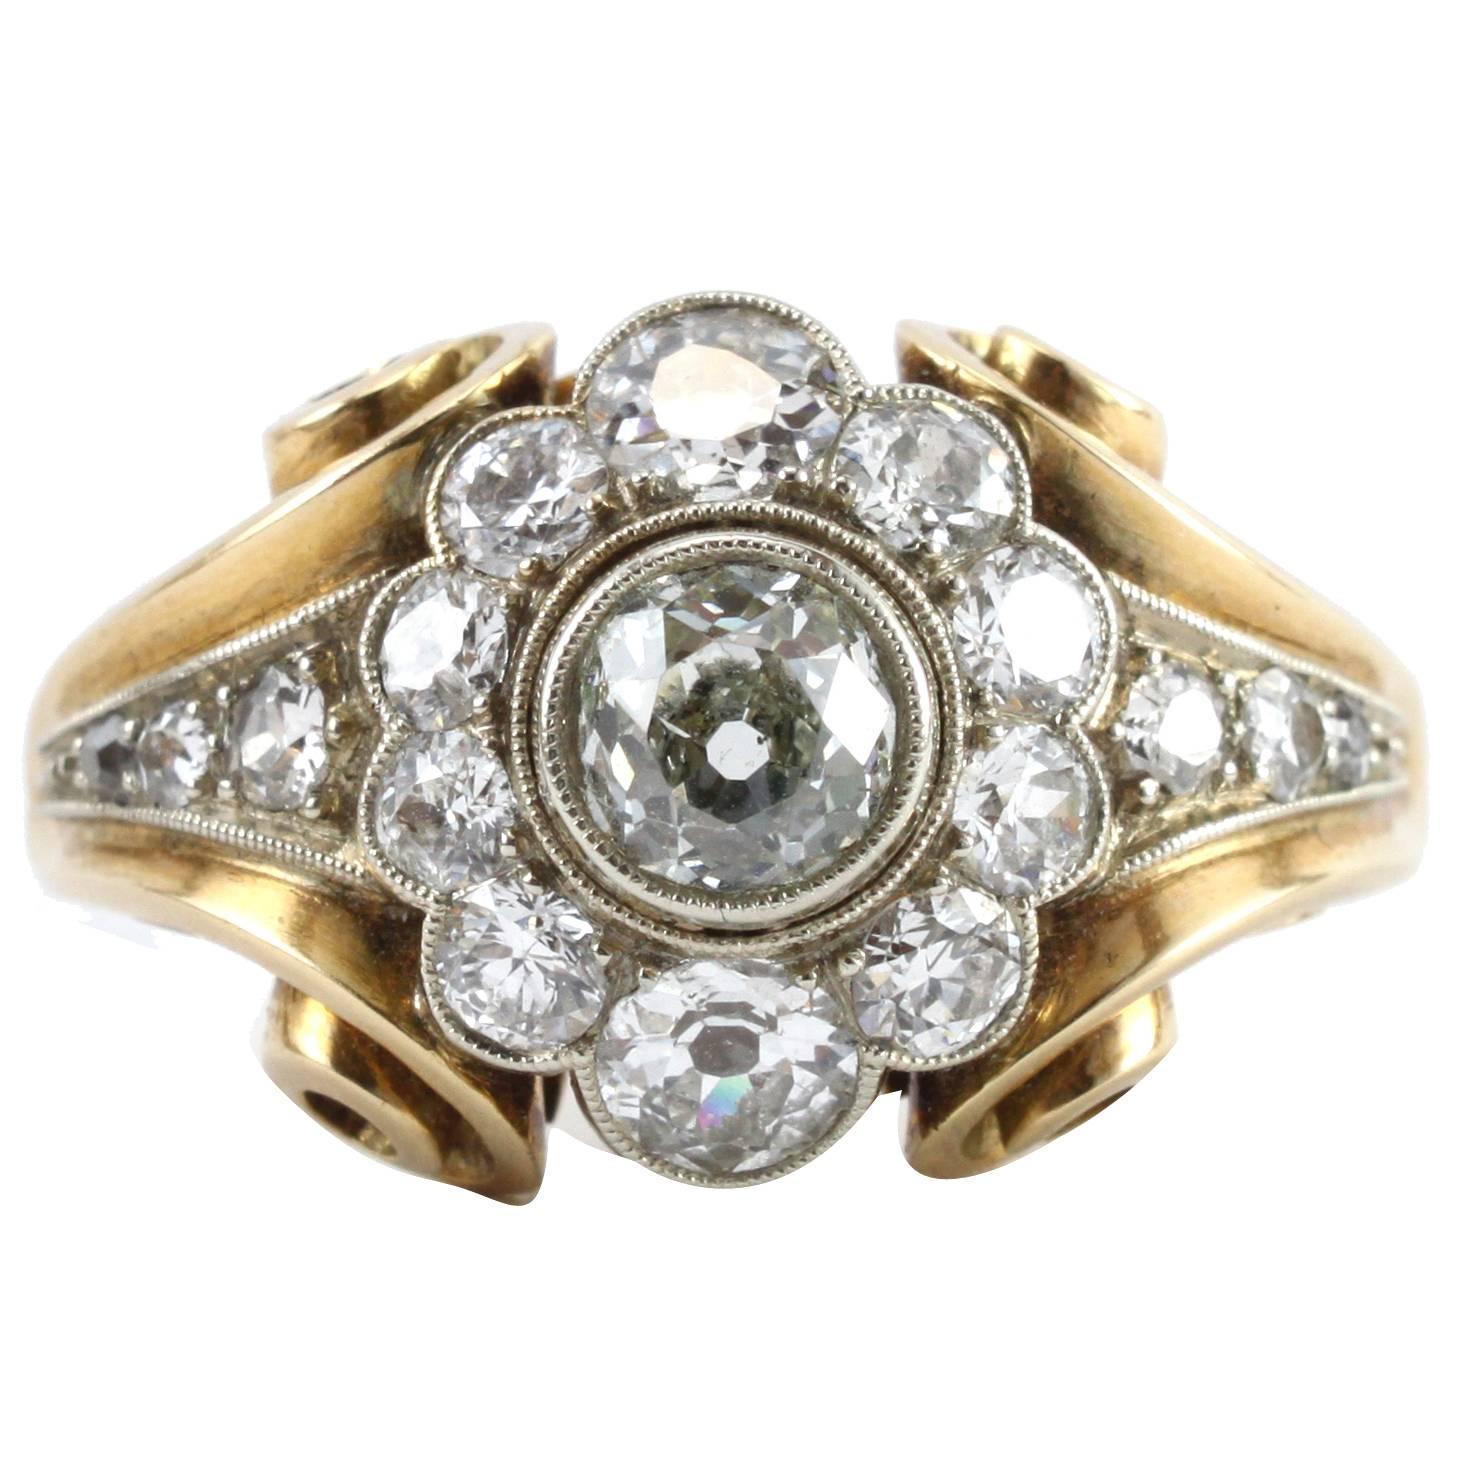 1940s Retro Diamond Gold Cluster Ring